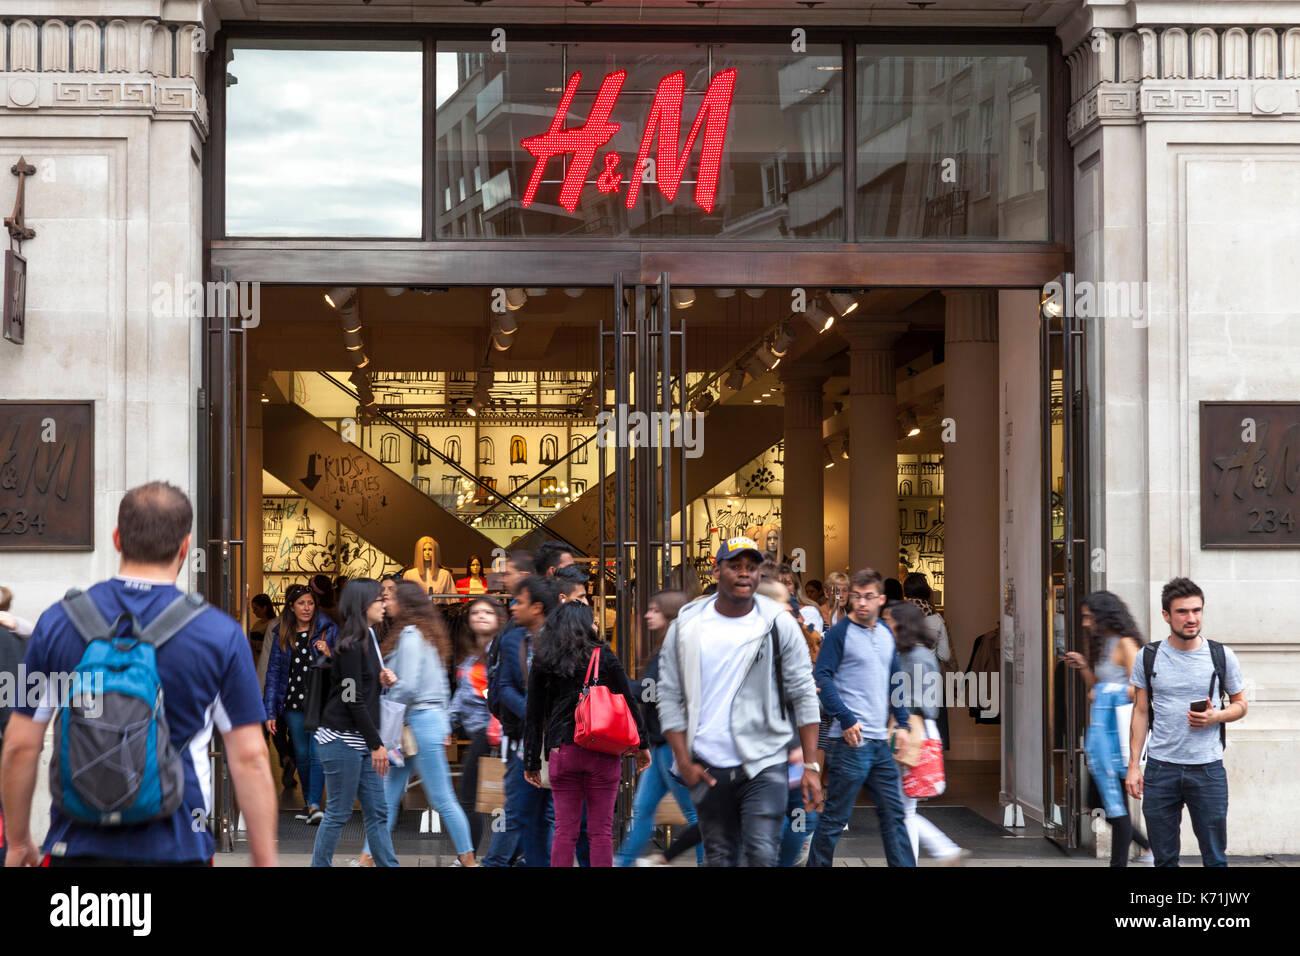 The H&M store on Regent Street, London, England, U.K. Stock Photo